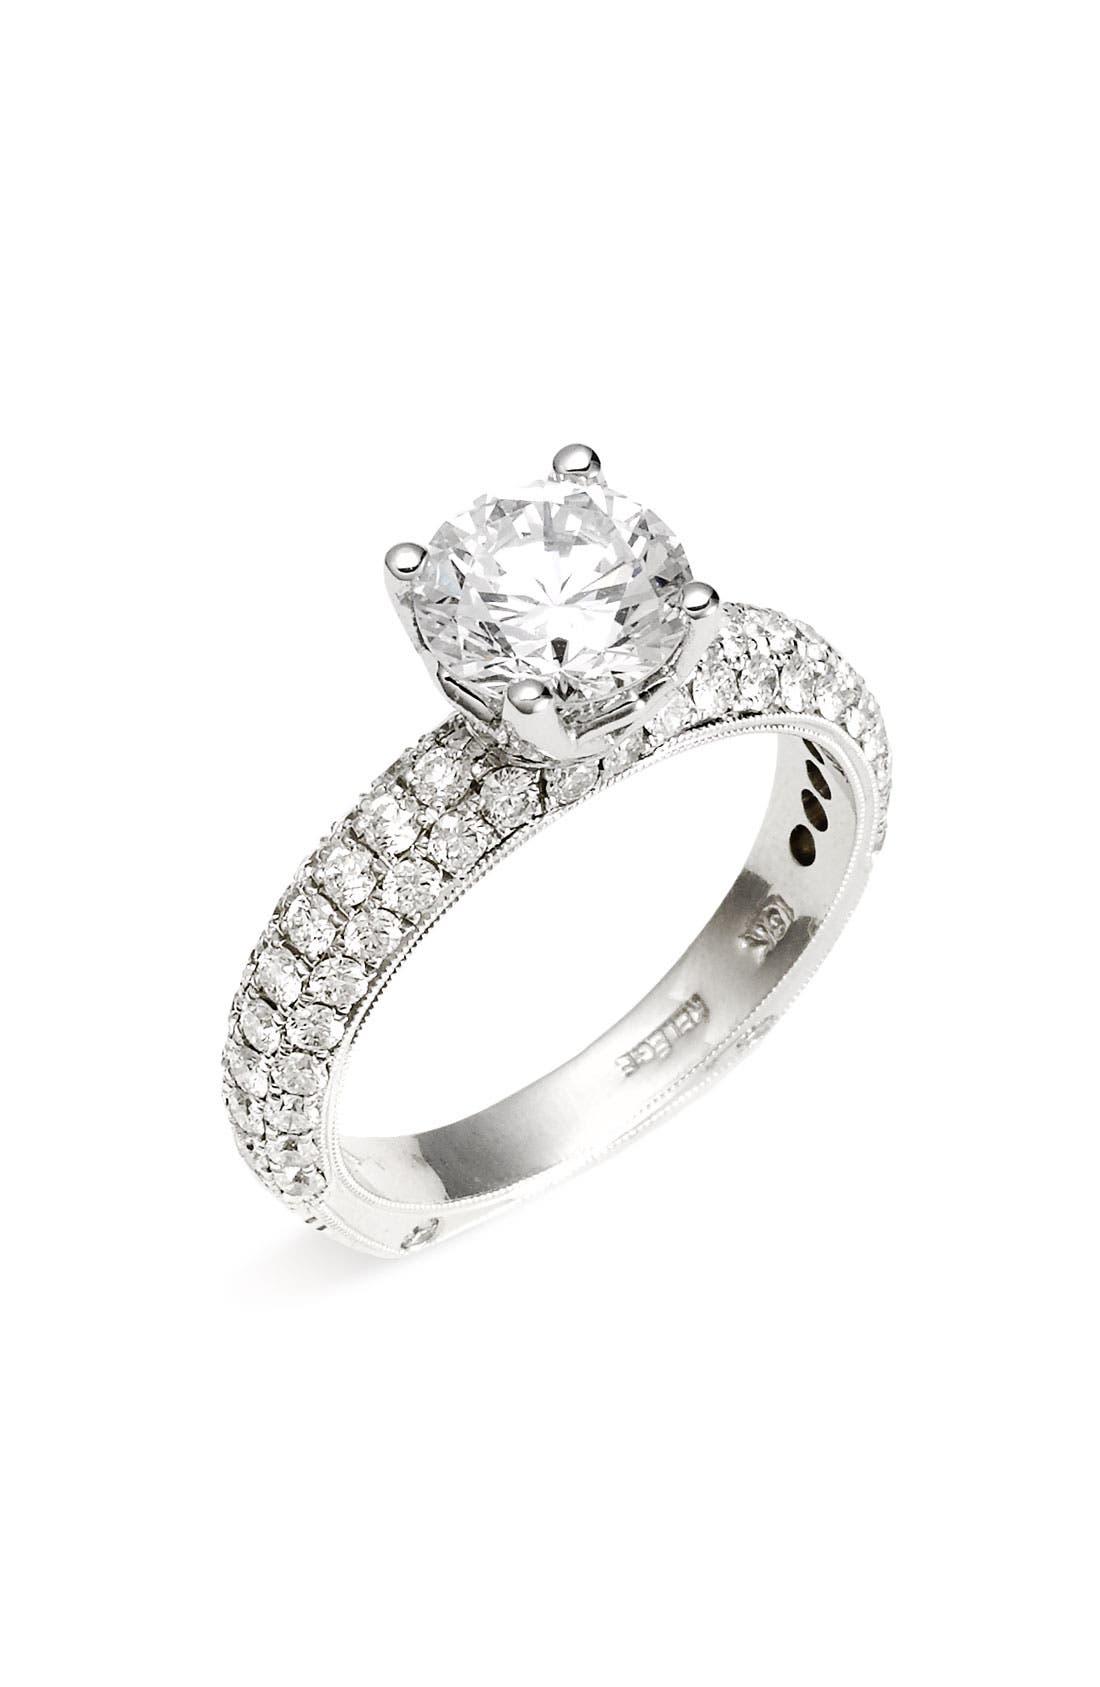 Alternate Image 1 Selected - Jack Kelége 'Romance' Pavé Diamond Engagement Ring Setting